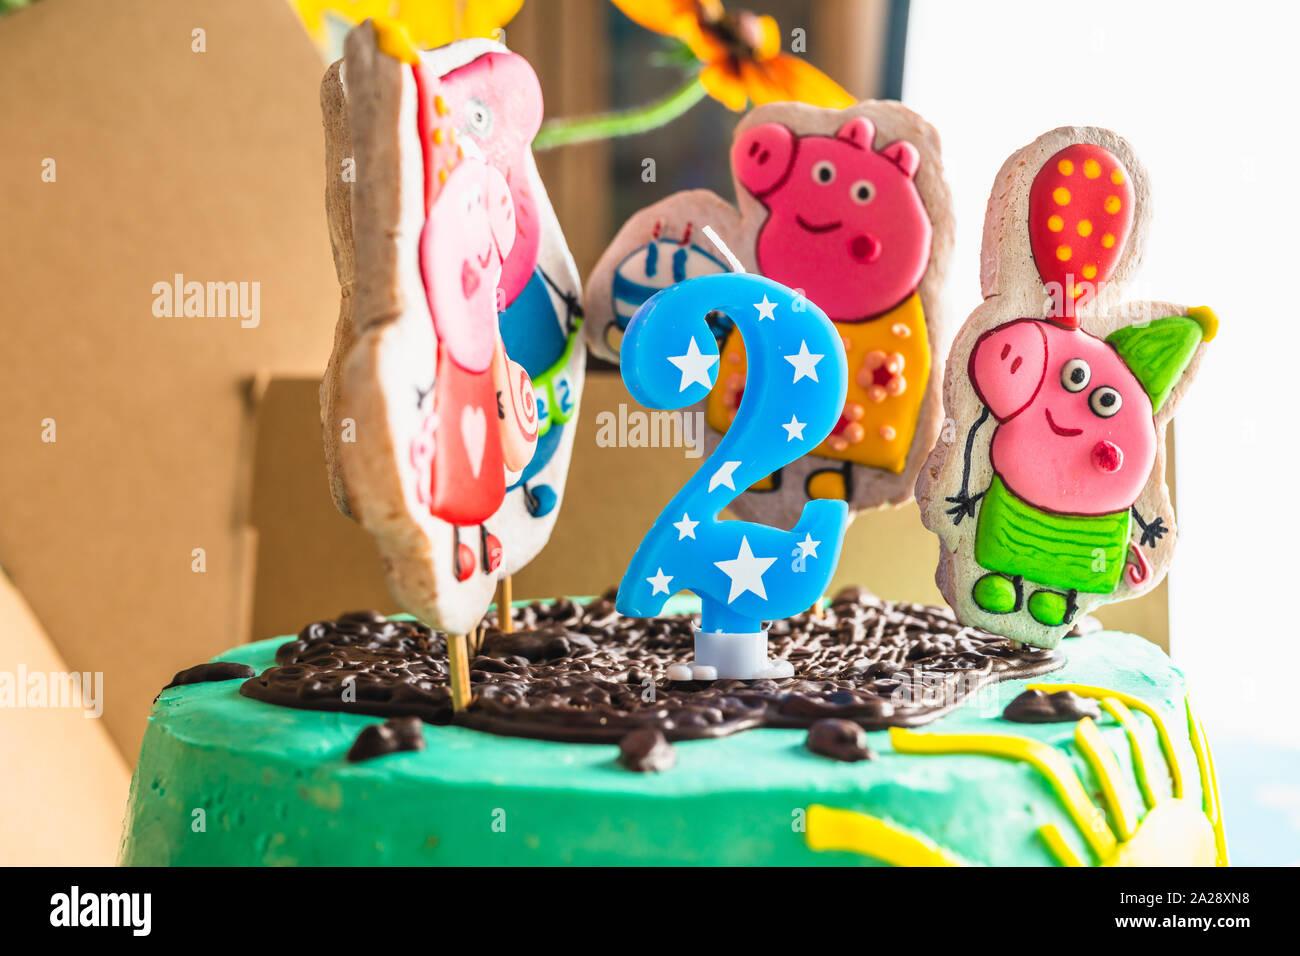 Admirable Peppa Pig Birthday Cake Happy 2 Years Birthday Cake Close Up Funny Birthday Cards Online Fluifree Goldxyz